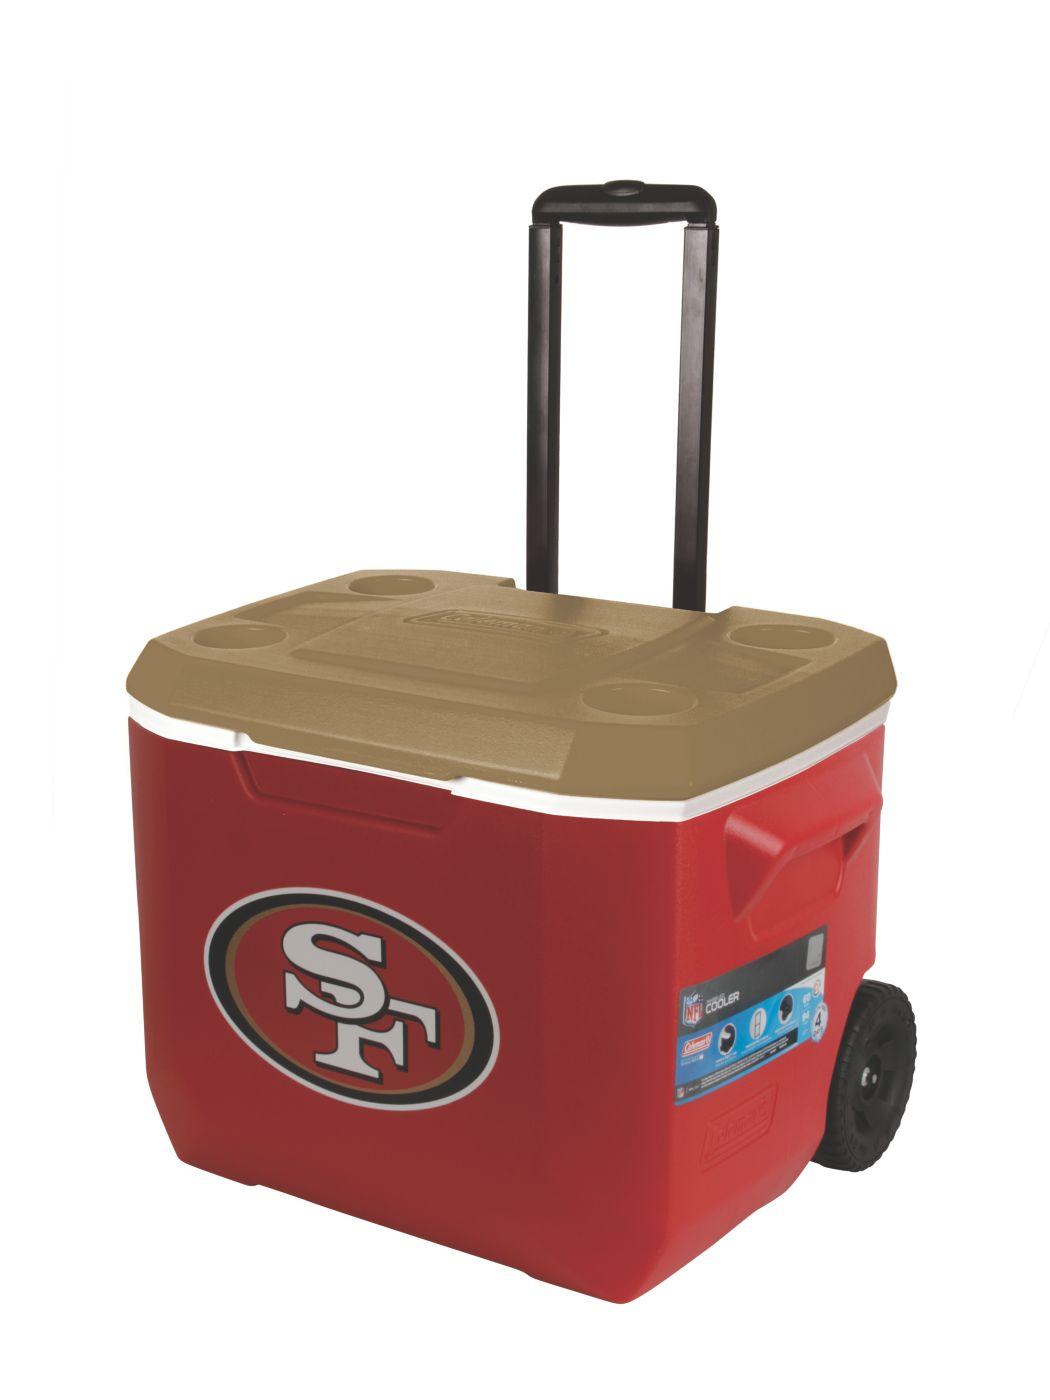 60 Quart Performance Wheeled Cooler - San Franscisco 49ers  sc 1 st  Coleman & 60 Quart Performance Wheeled Cooler - San Franscisco 49ers - USA